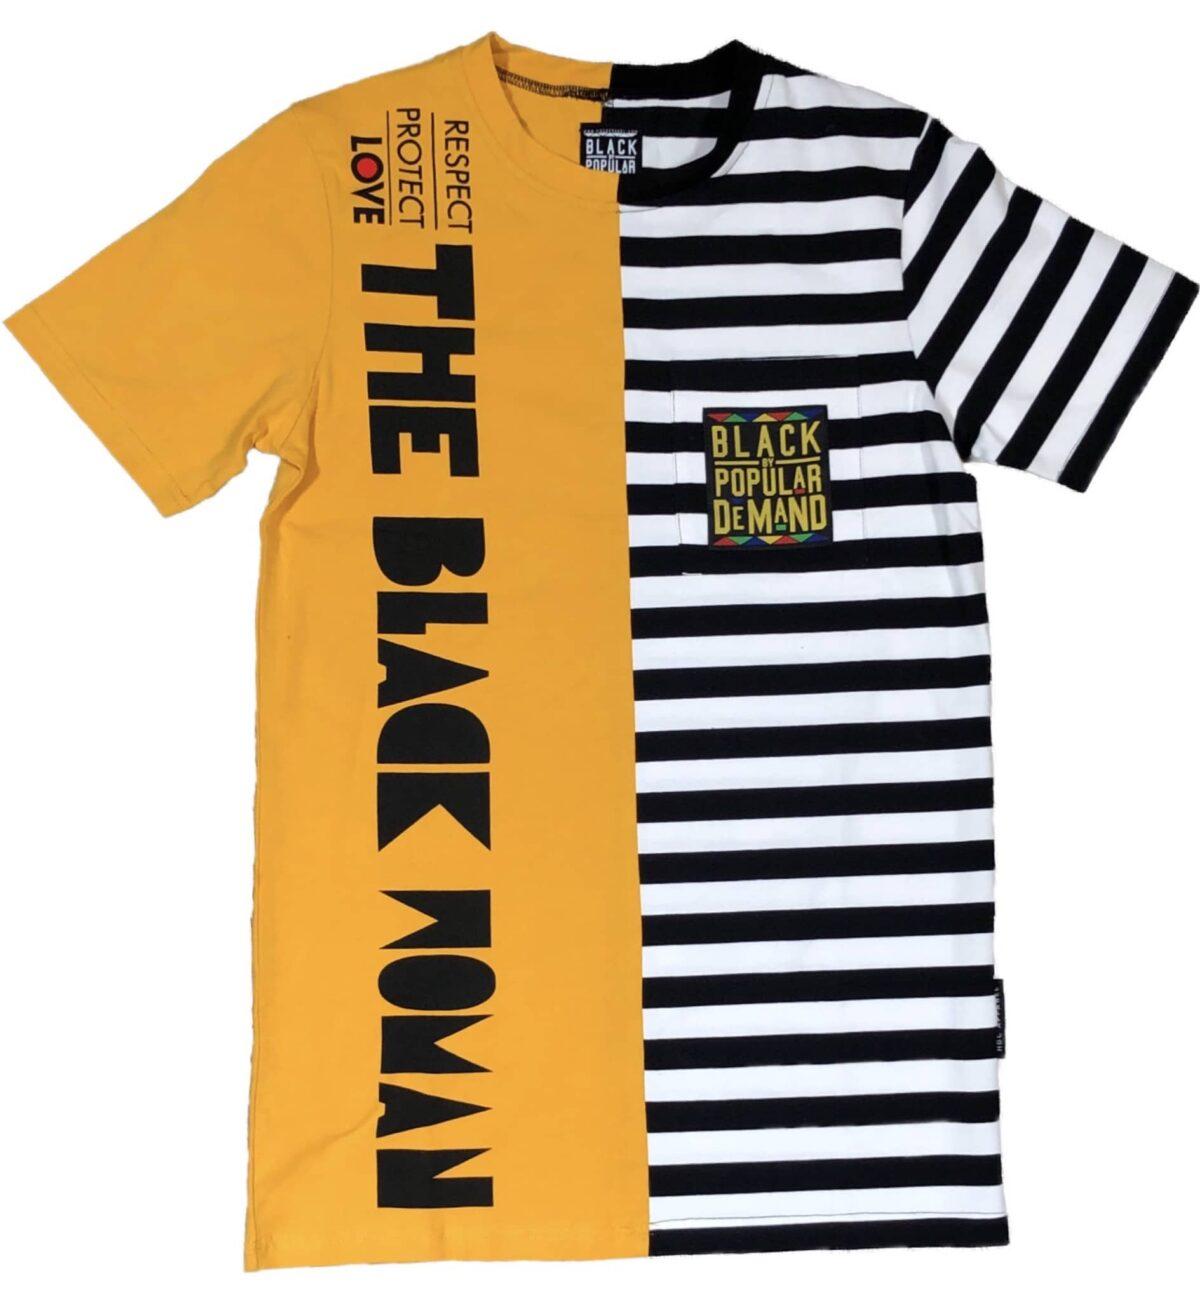 Respect Protect Love The Black Woman® Unisex Split Striped Shirt HGC Apparel